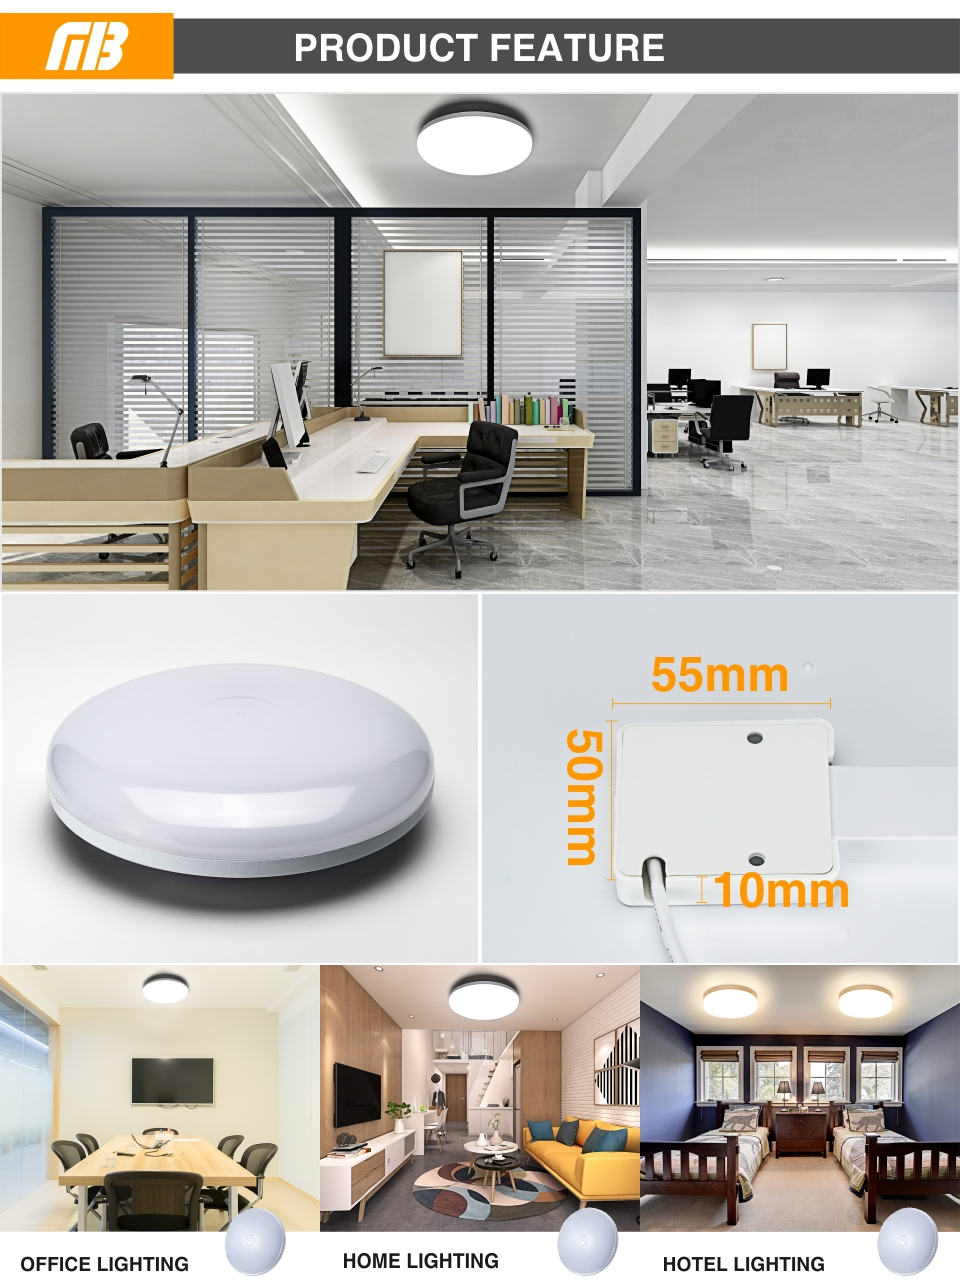 HTB1yXmMatfvK1RjSspfq6zzXFXav LED Panel Lamp LED Ceiling Light 48W 36W 24W 18W 13W 9W 6W Down Light Surface Mounted AC 85-265V Modern Lamp For Home Lighting